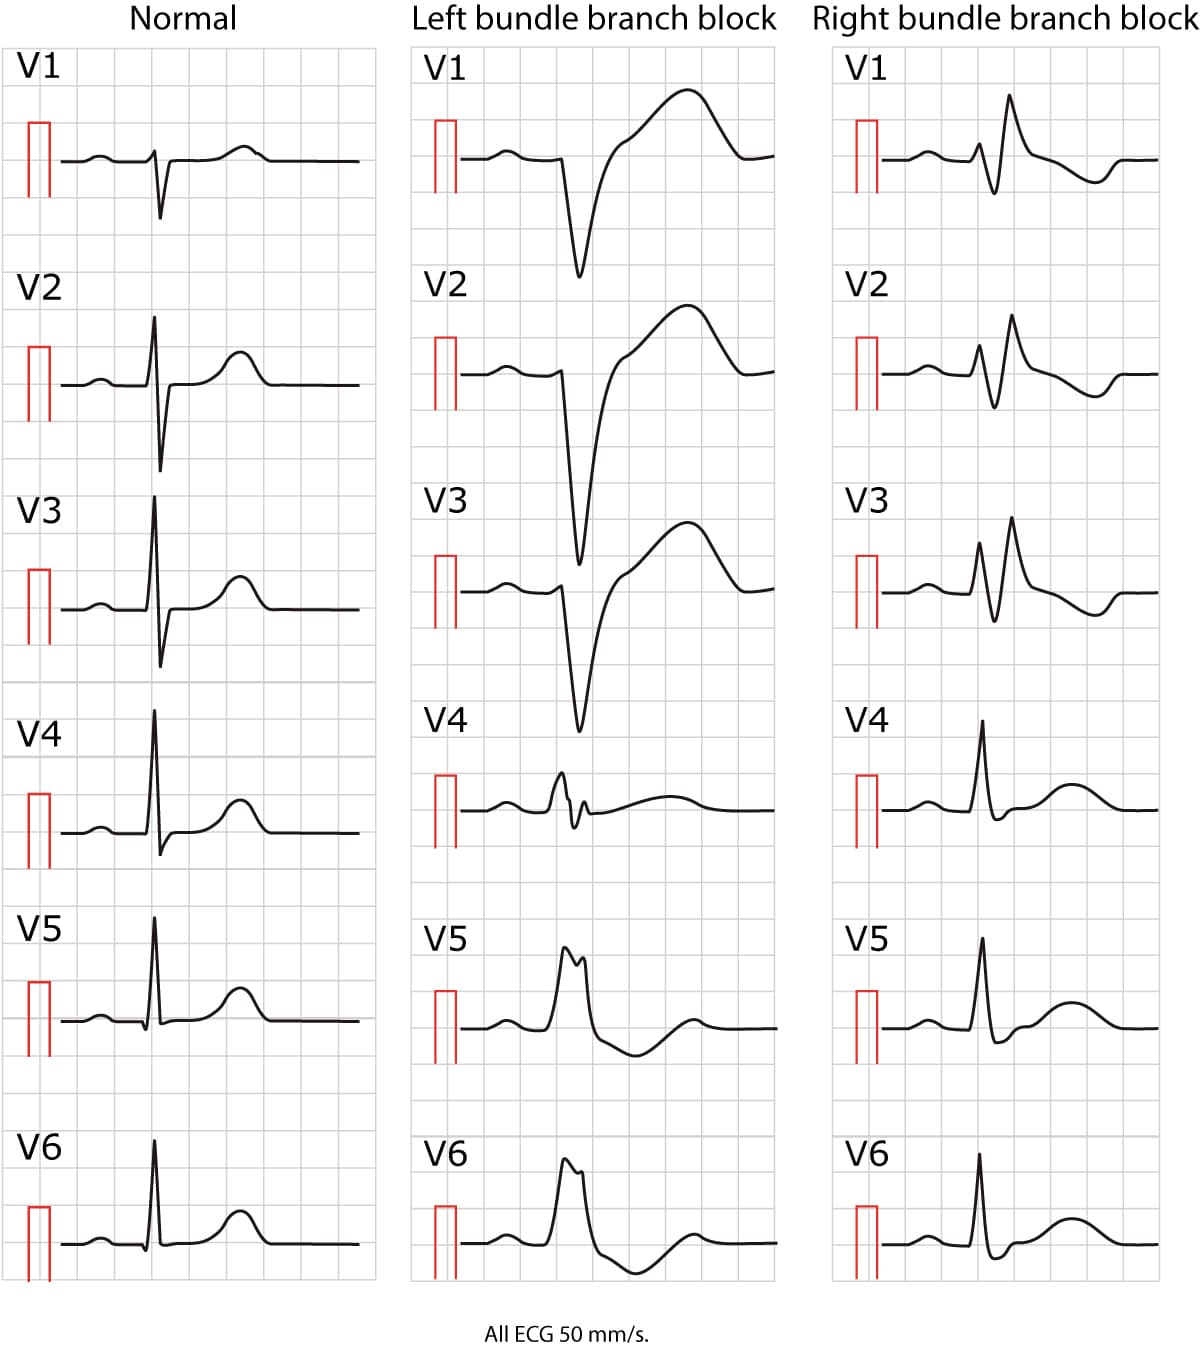 Figure 1. Normal ECG, Left Bundle Branch Block And Right